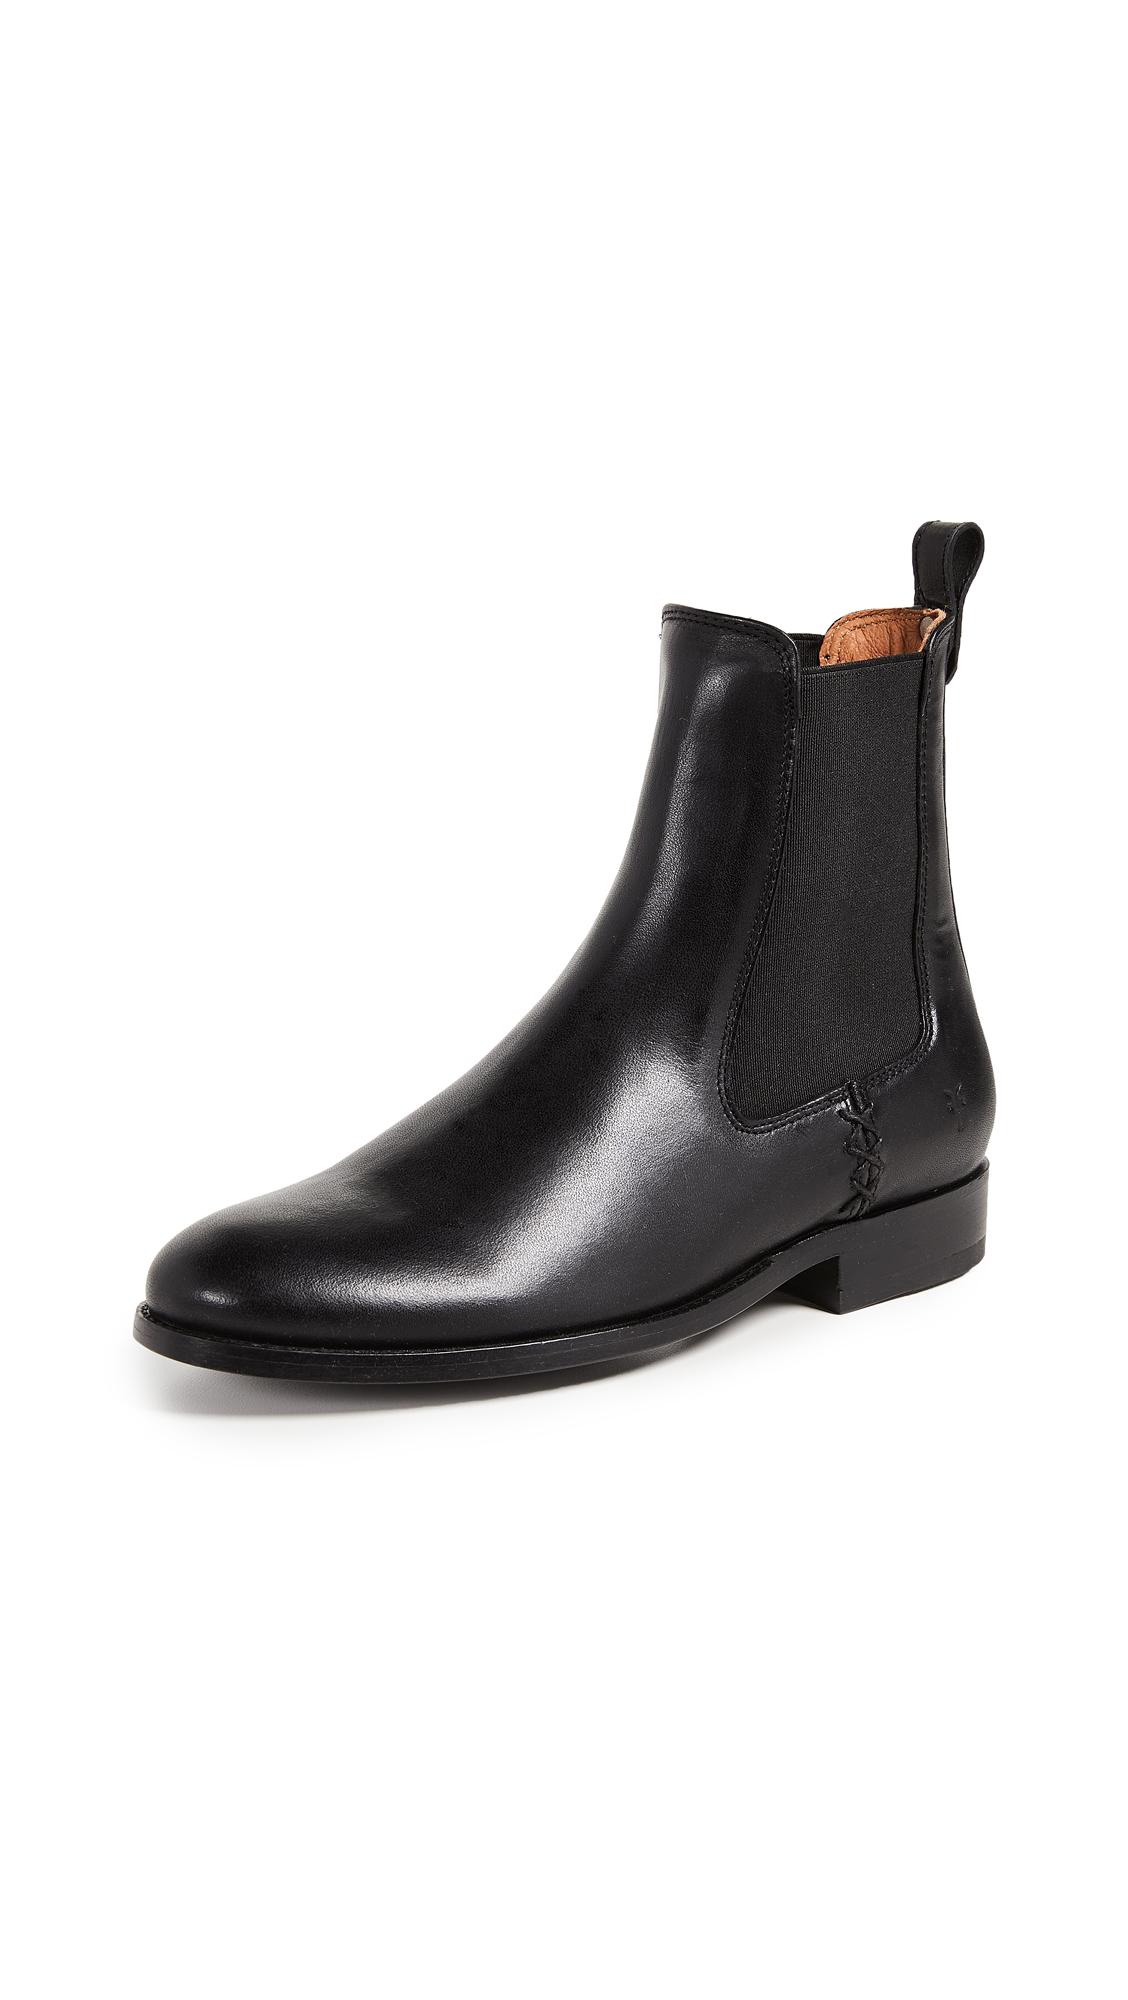 Frye Melissa Chelsea Boots - Black